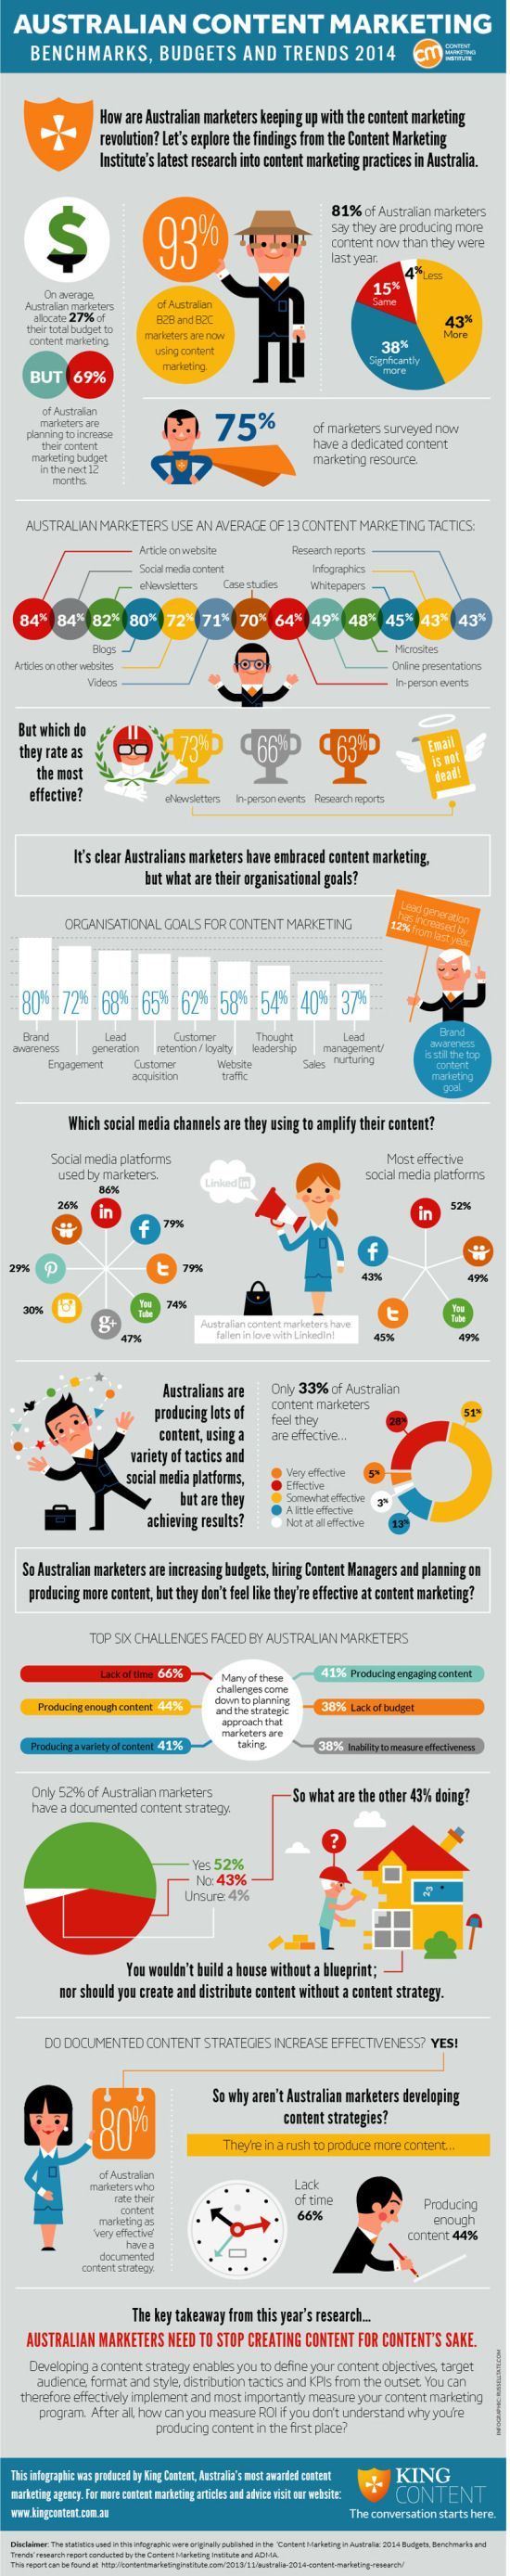 Content Marketing Trends 2014 Australia